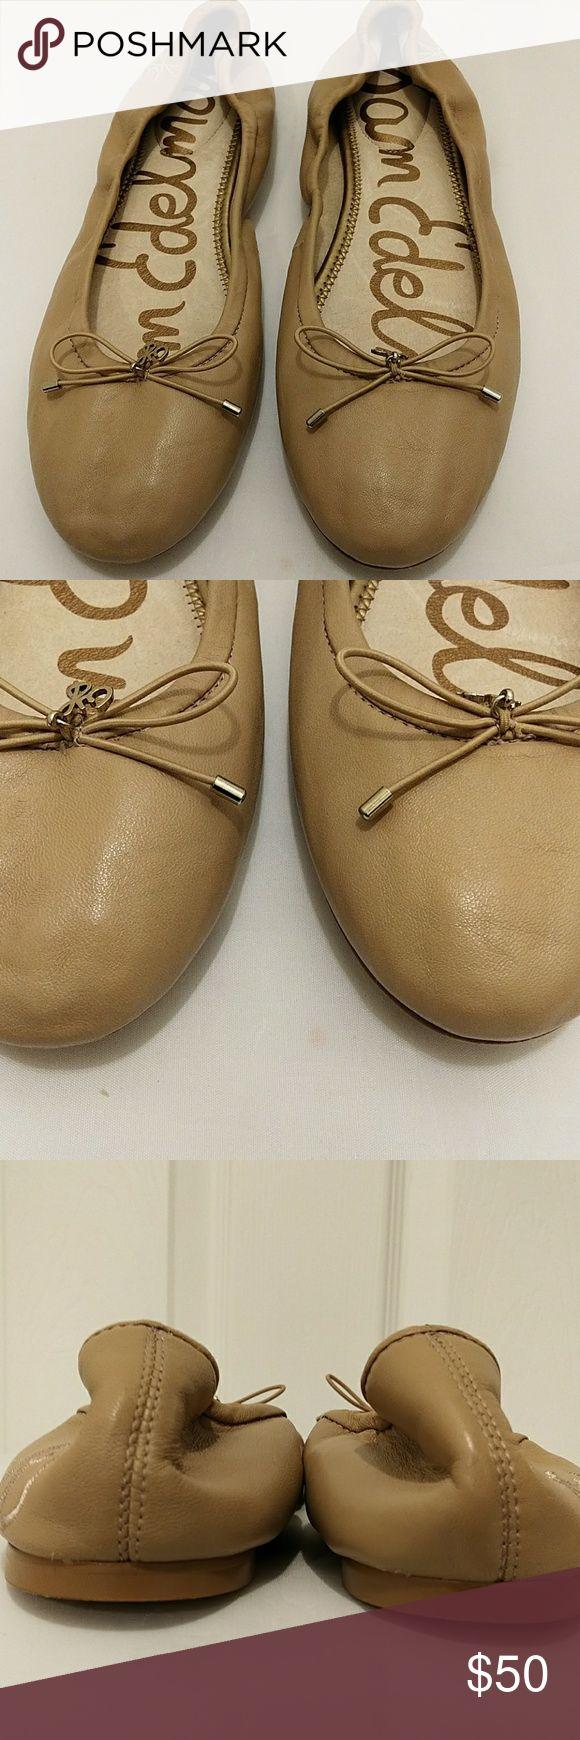 Sam Edelman leather ballet flats Excellent condition no steans no rips Sam Edelman Shoes Flats & Loafers